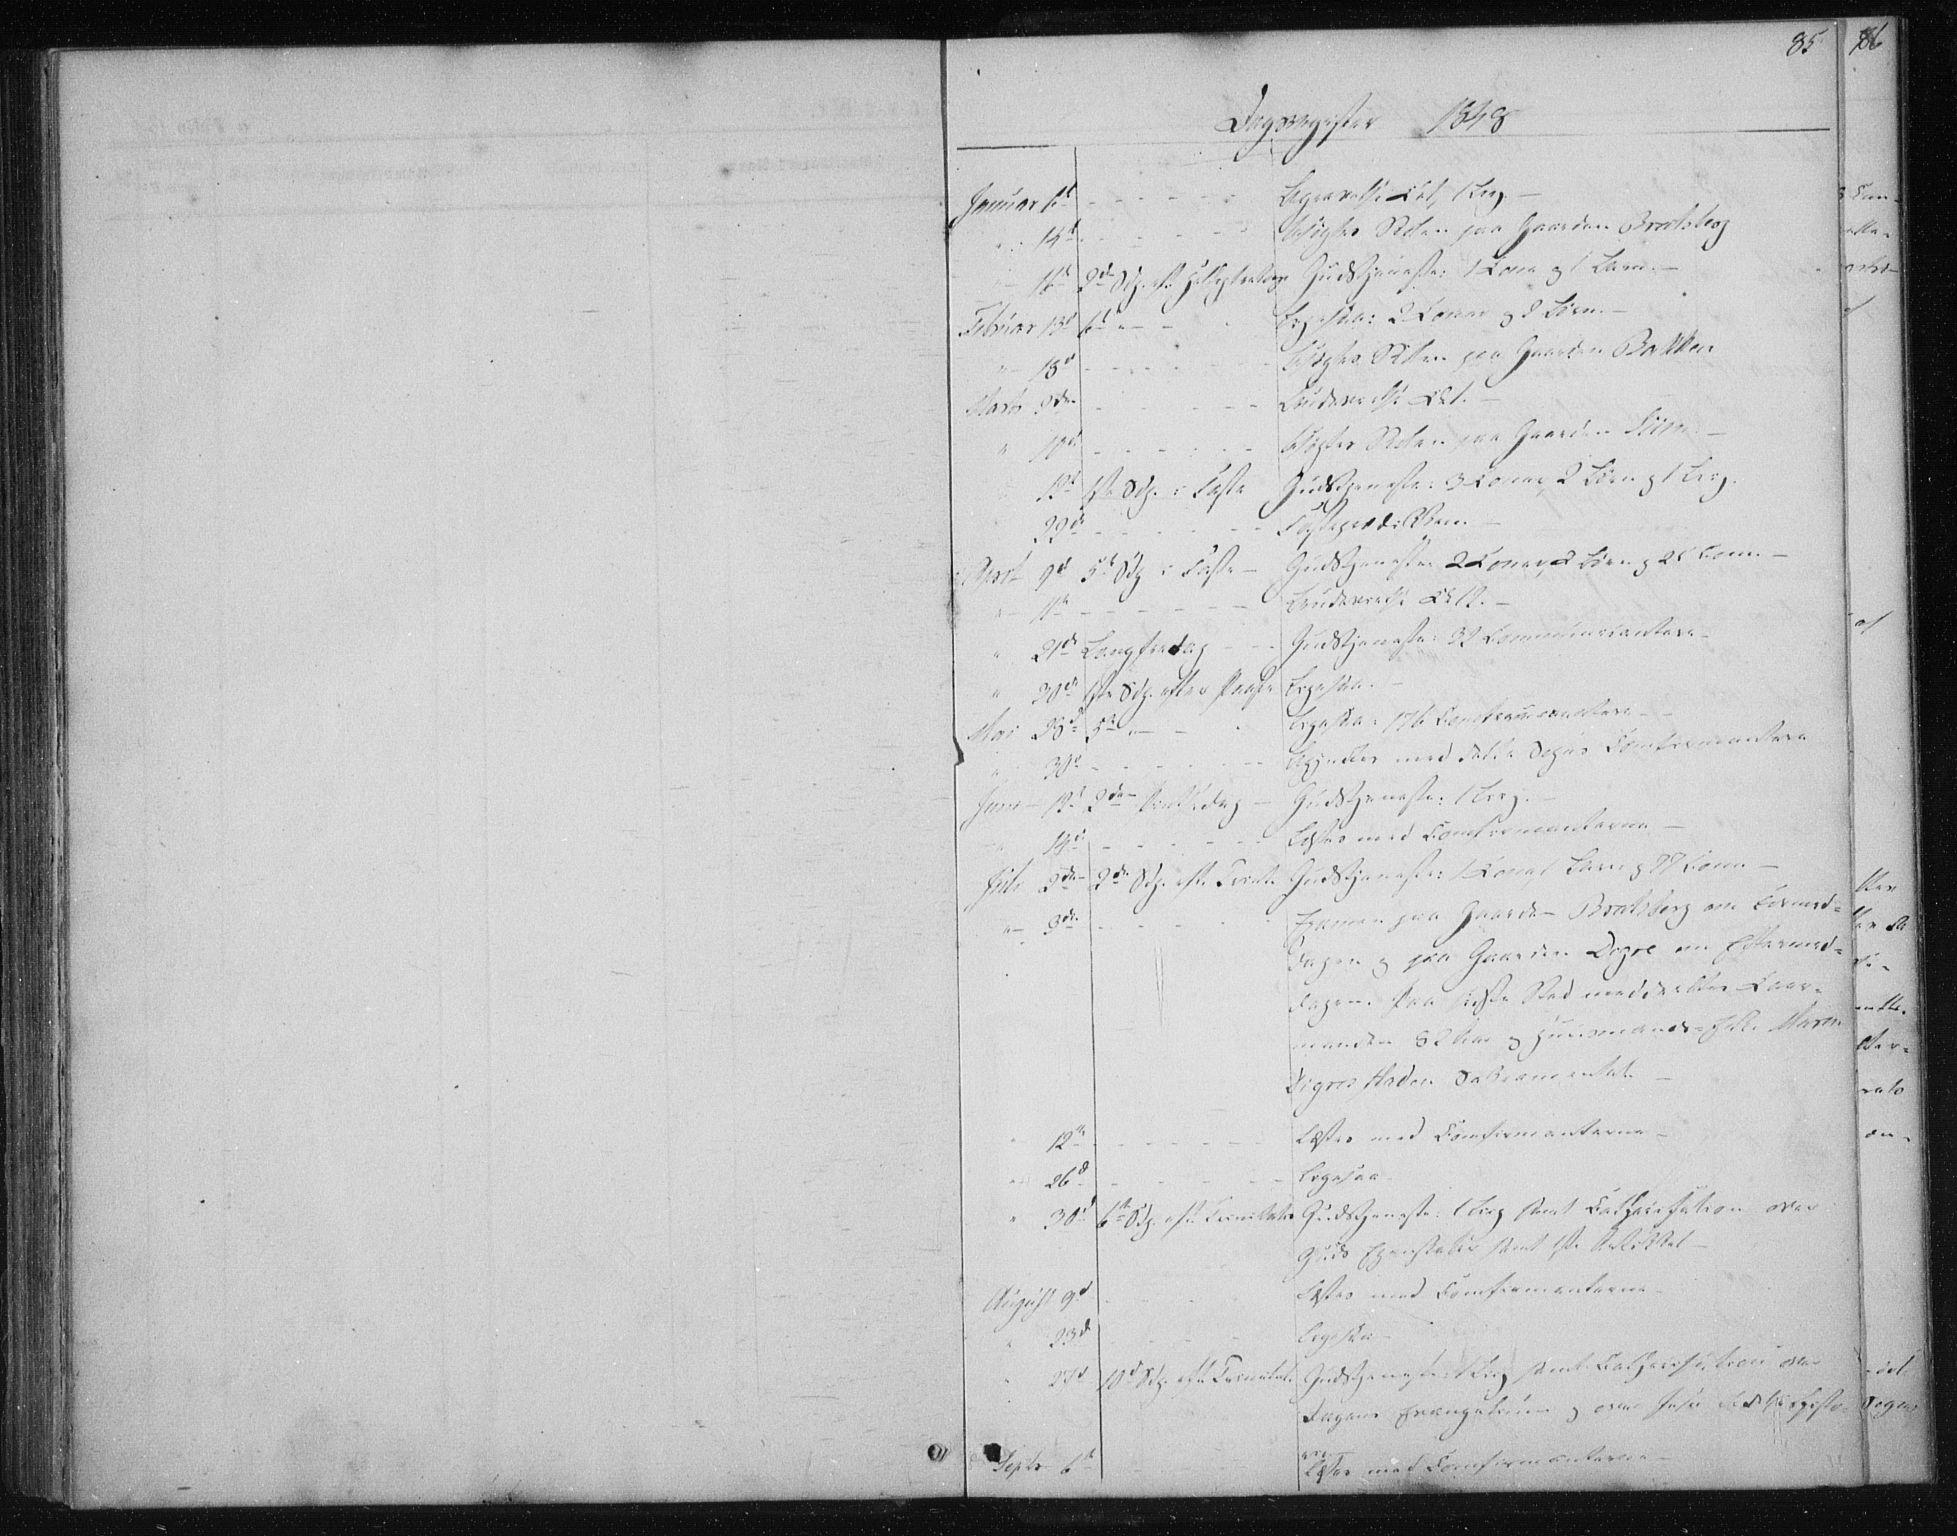 SAT, Ministerialprotokoller, klokkerbøker og fødselsregistre - Sør-Trøndelag, 608/L0332: Parish register (official) no. 608A01, 1848-1861, p. 85